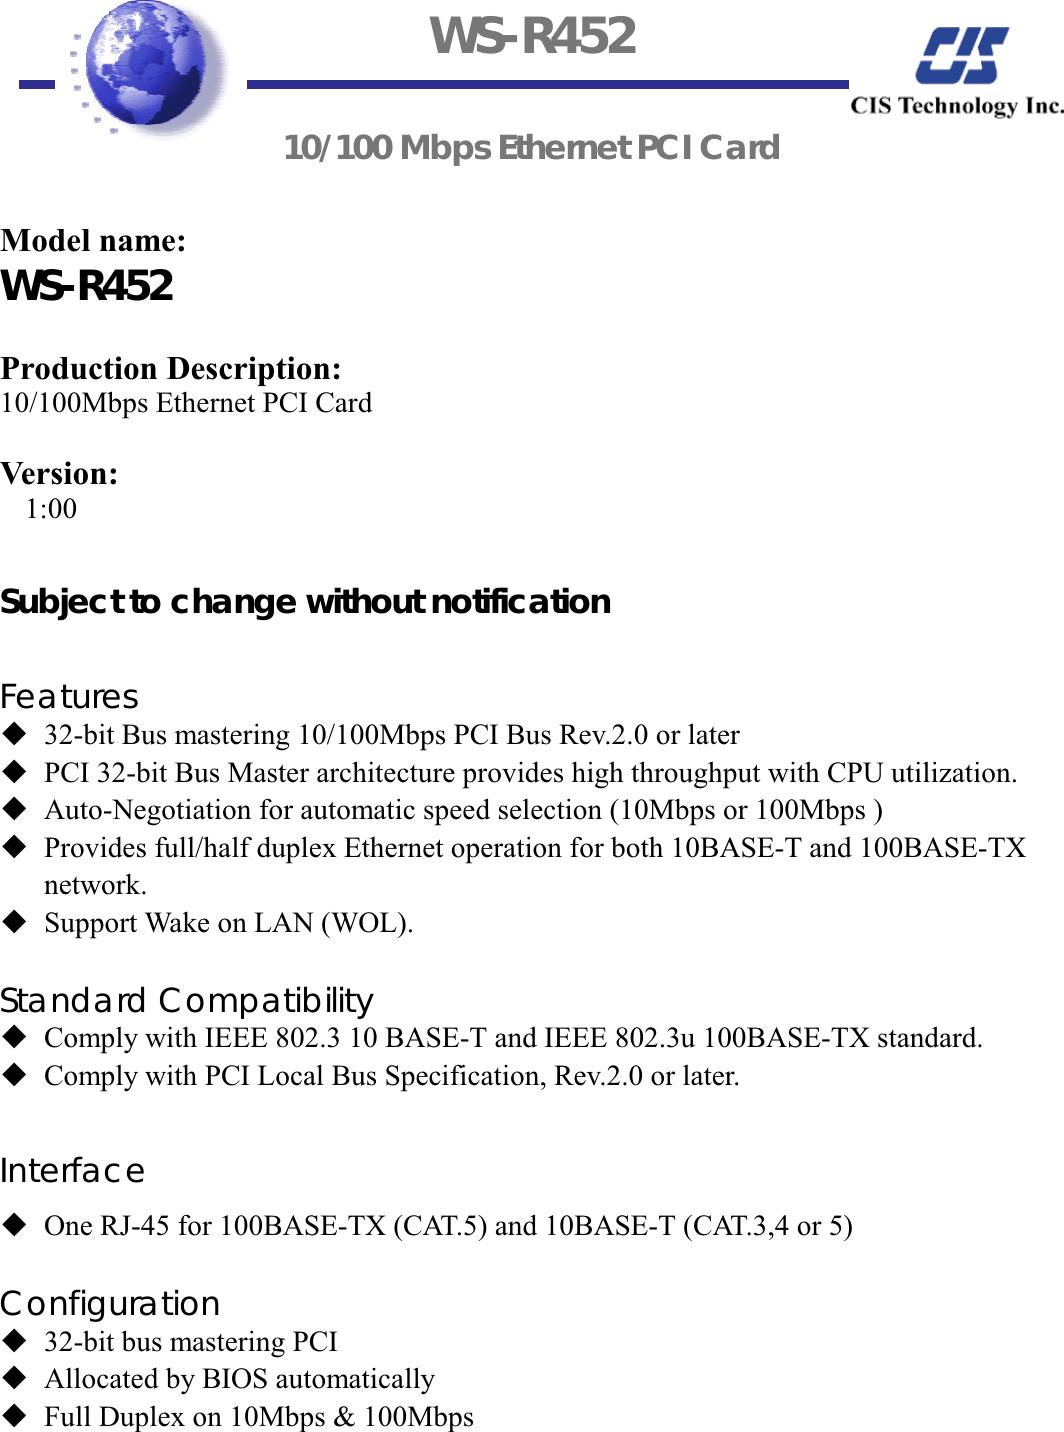 HP WS-R452 WINDOWS 8 X64 DRIVER DOWNLOAD